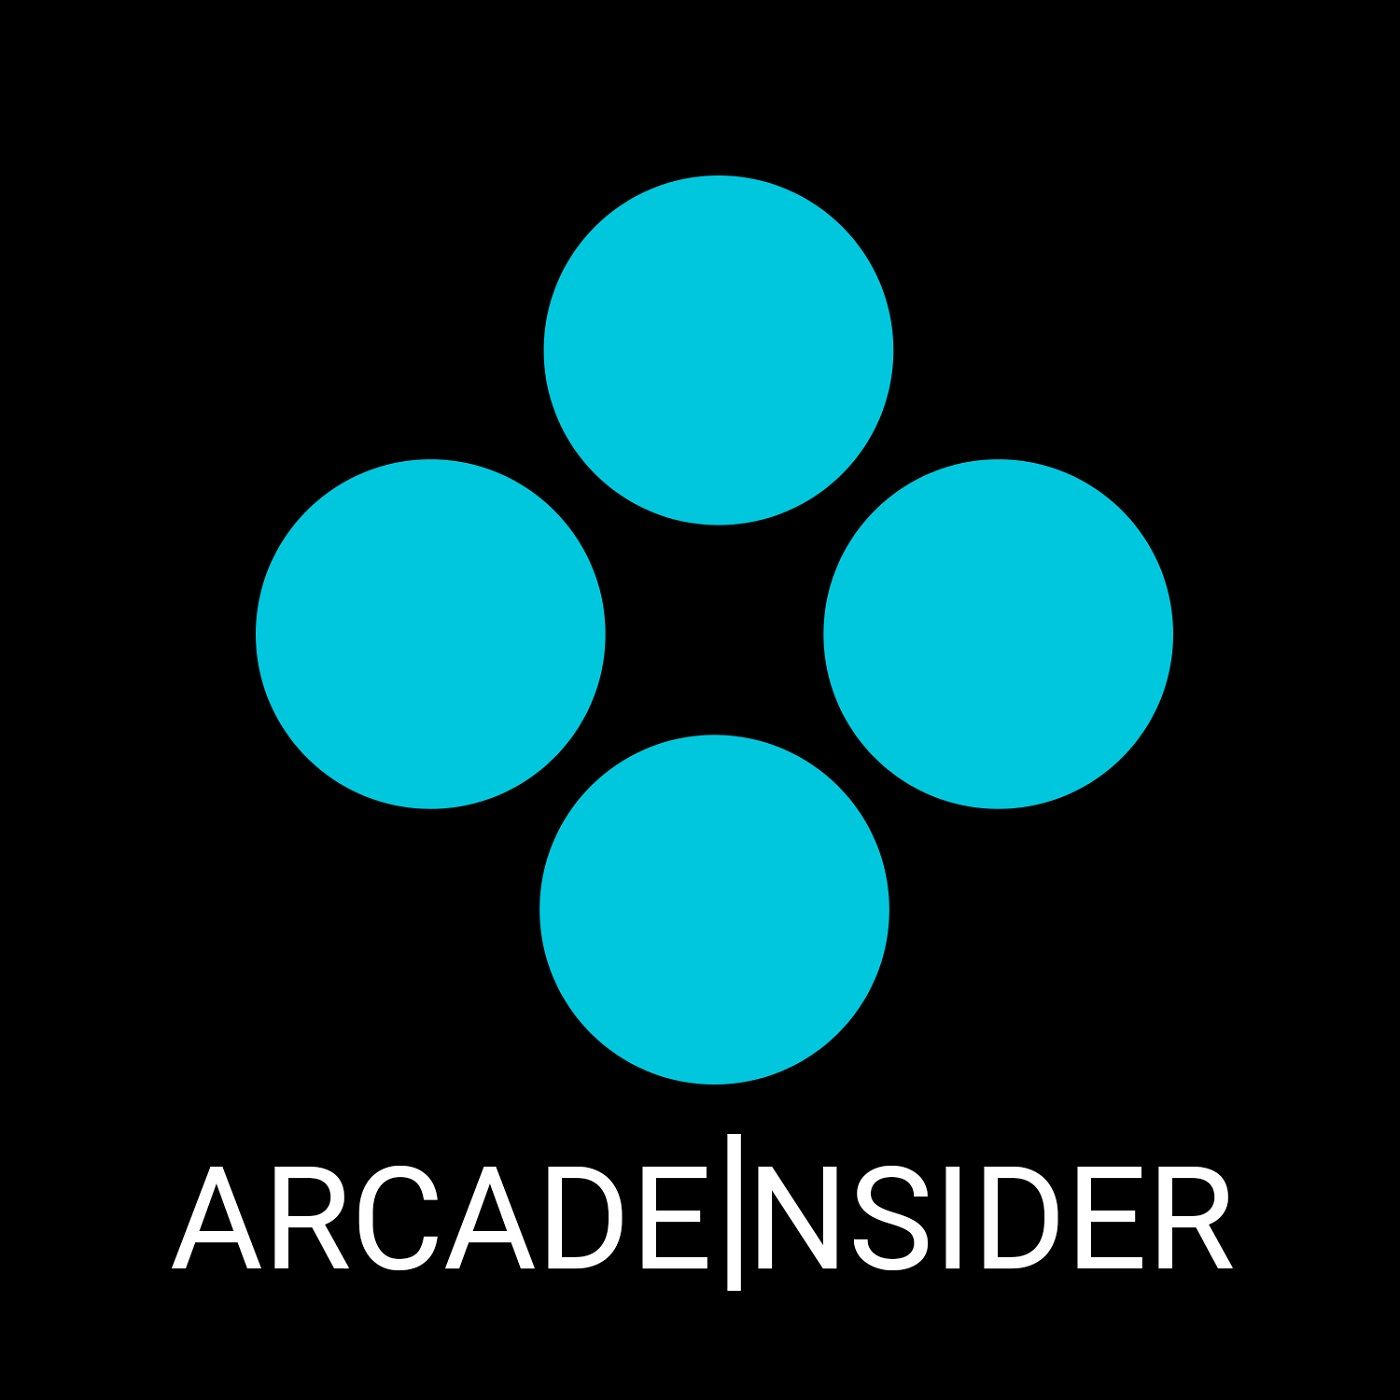 Arcade Insider